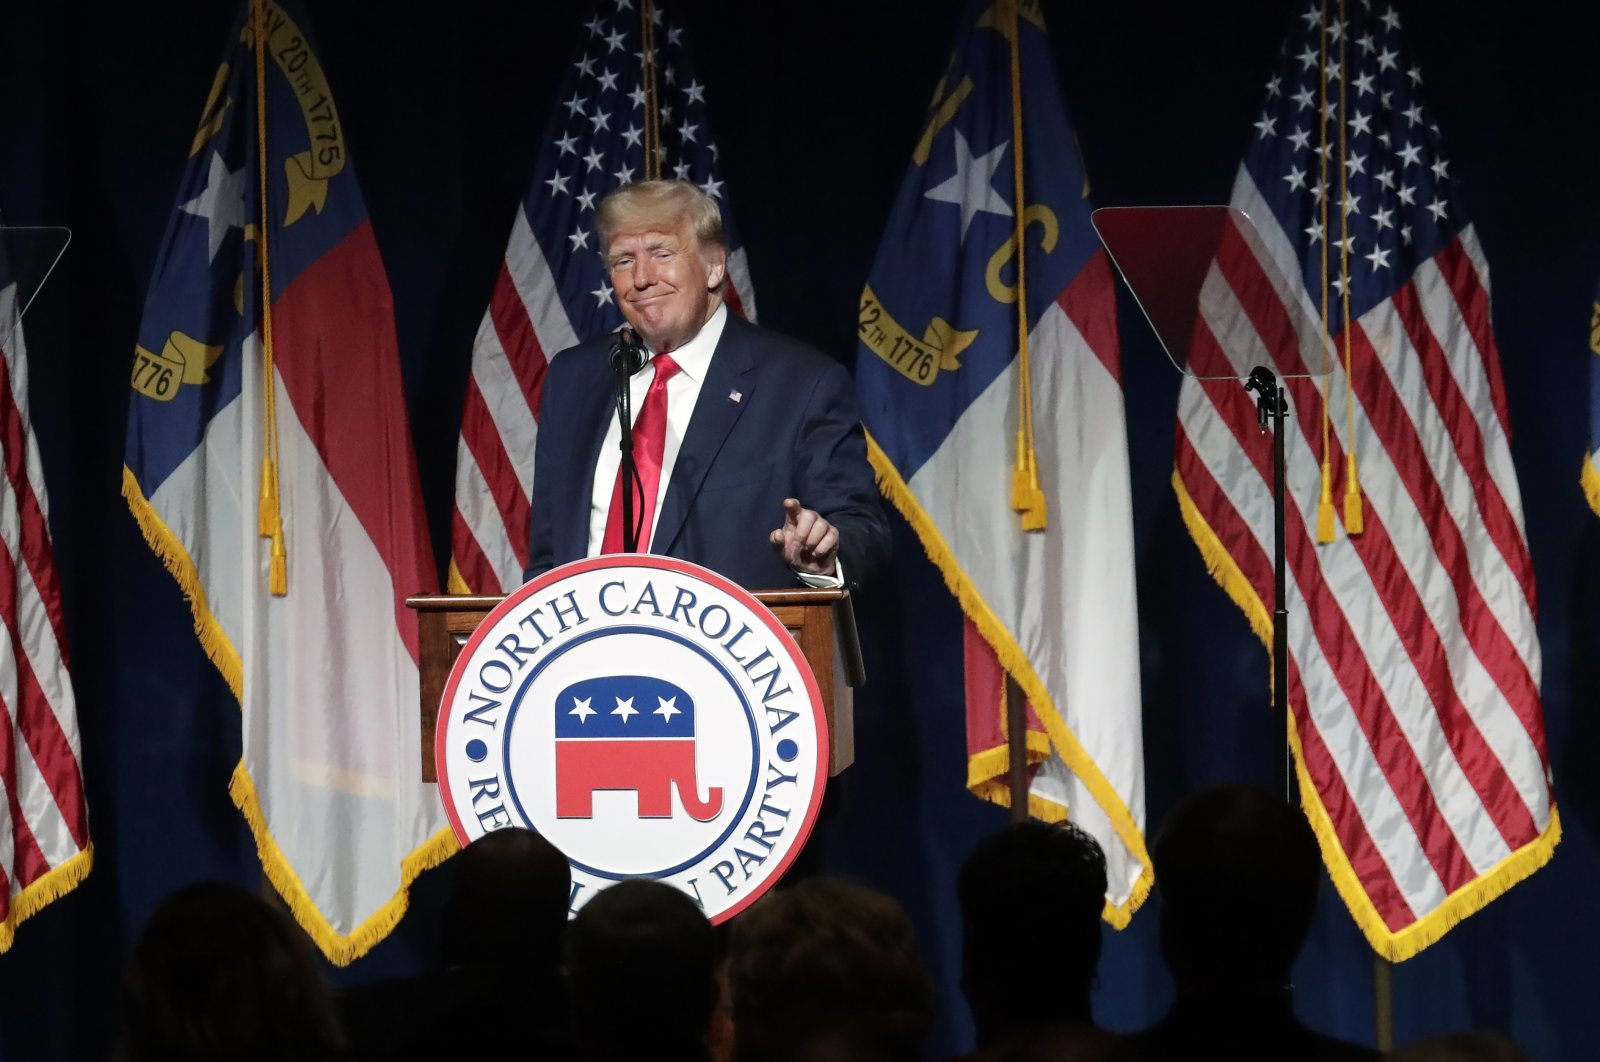 Former U.S. President Donald Trump speaks at the North Carolina Republican Convention in Greenville, N.C., U.S., June 5, 2021. (AP Photo)